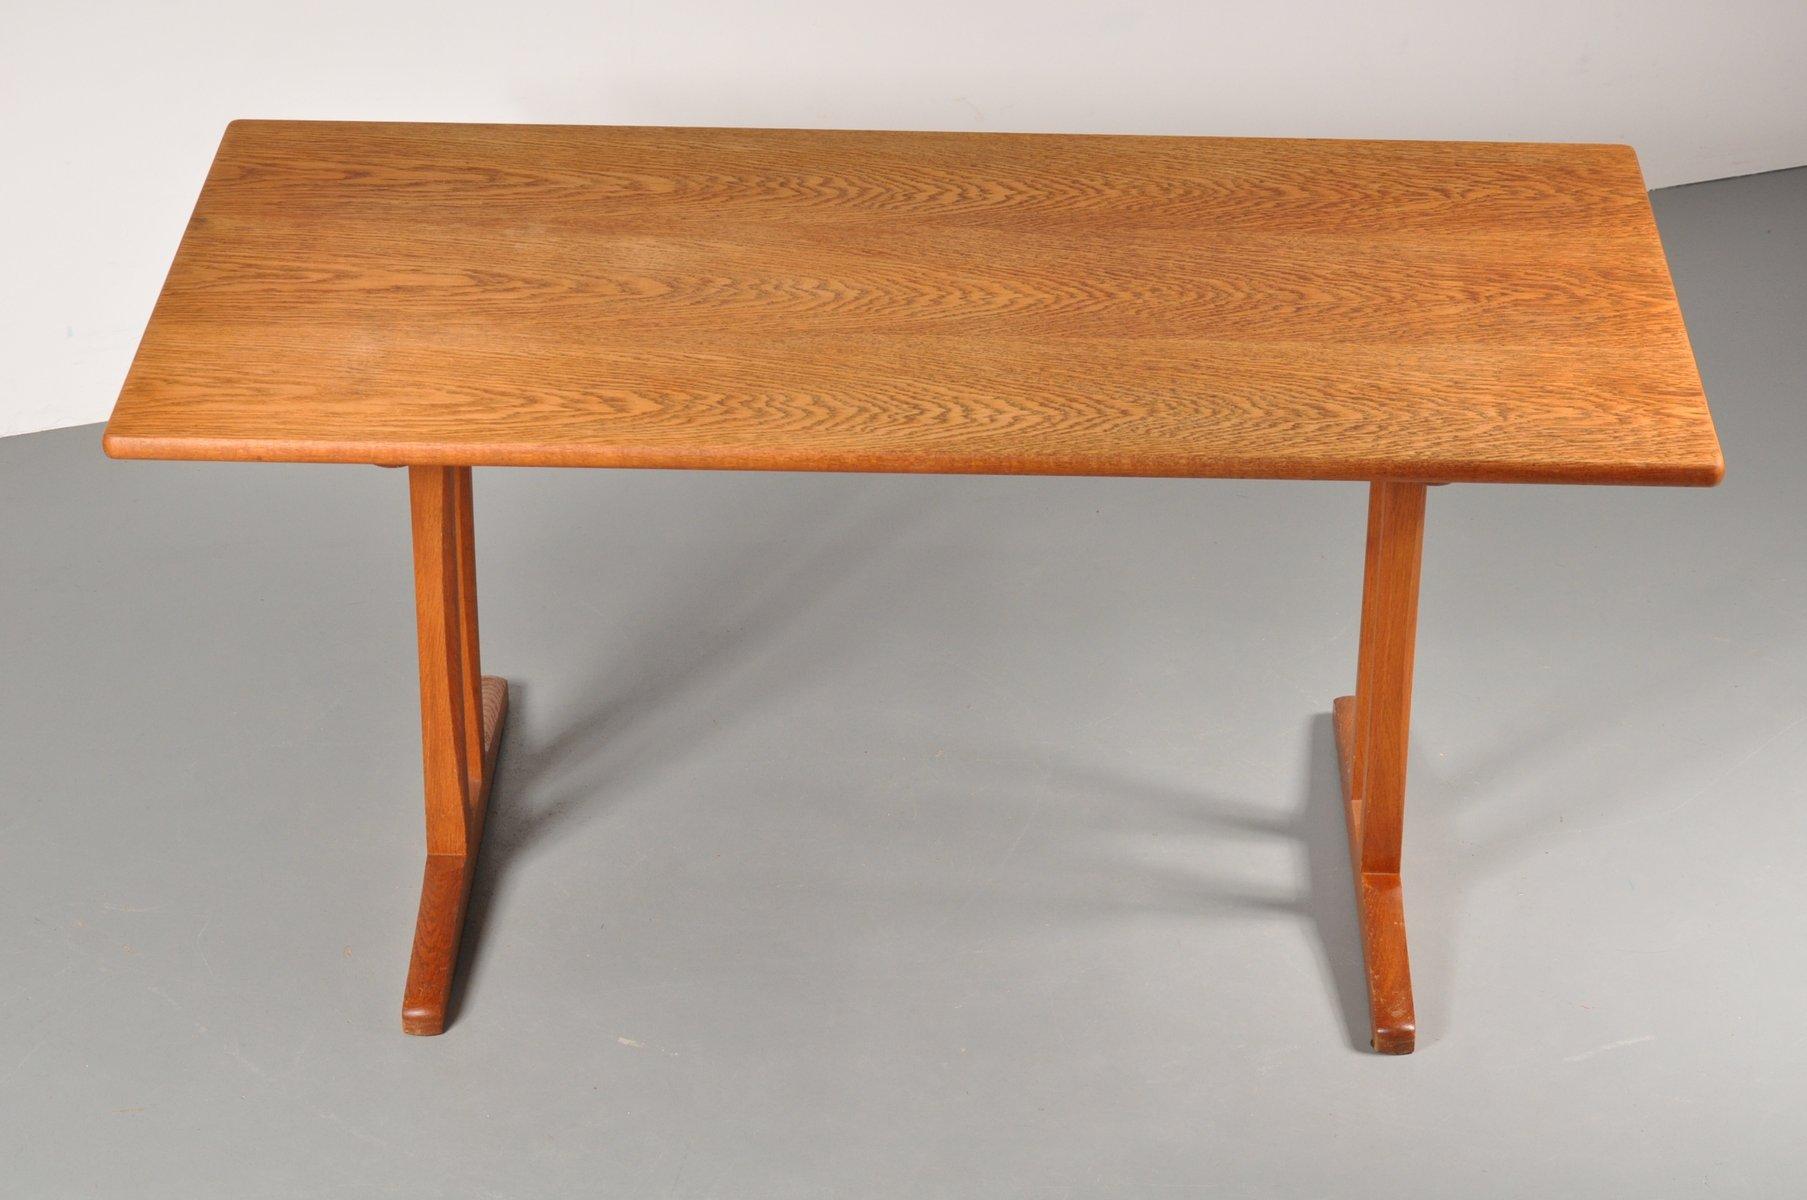 Scandinavian Shaker Dining Table By Borge Mogensen For FDB, 1960s